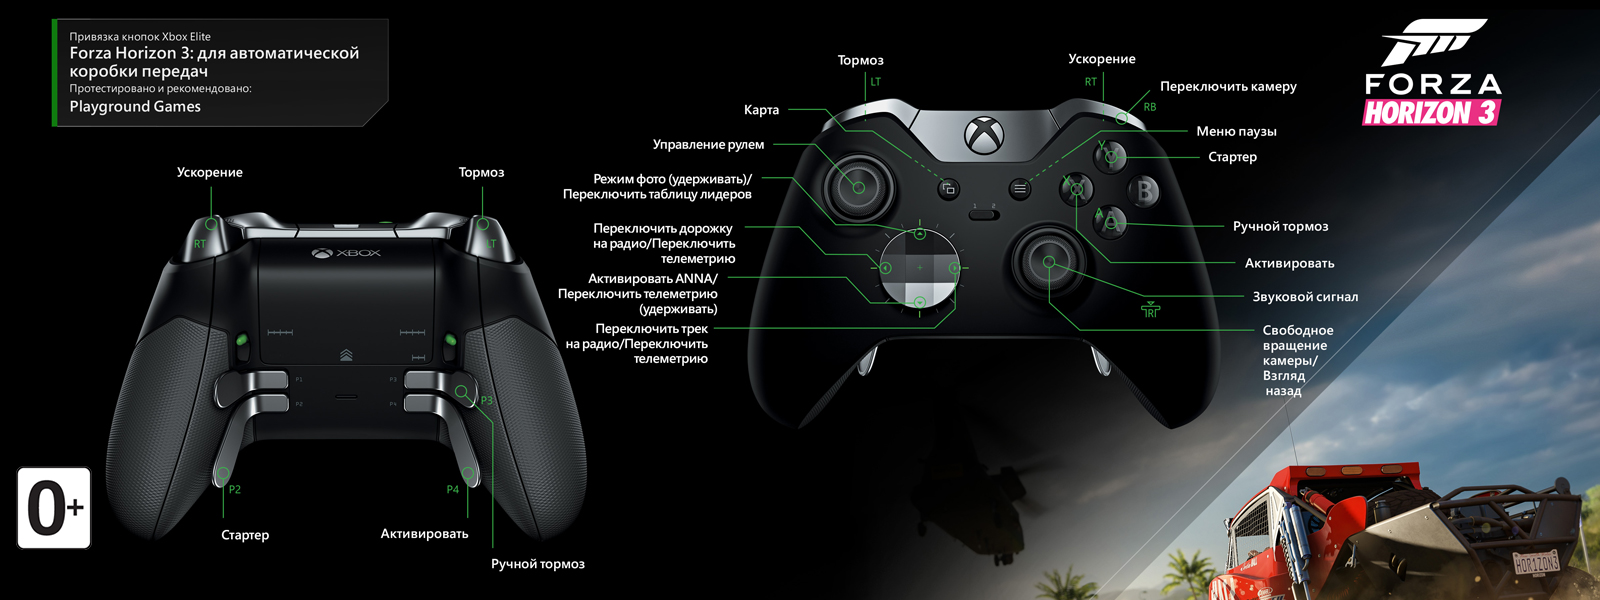 Forza Horizon 3 — раскладка для автоматической коробки передач под геймпад Elite